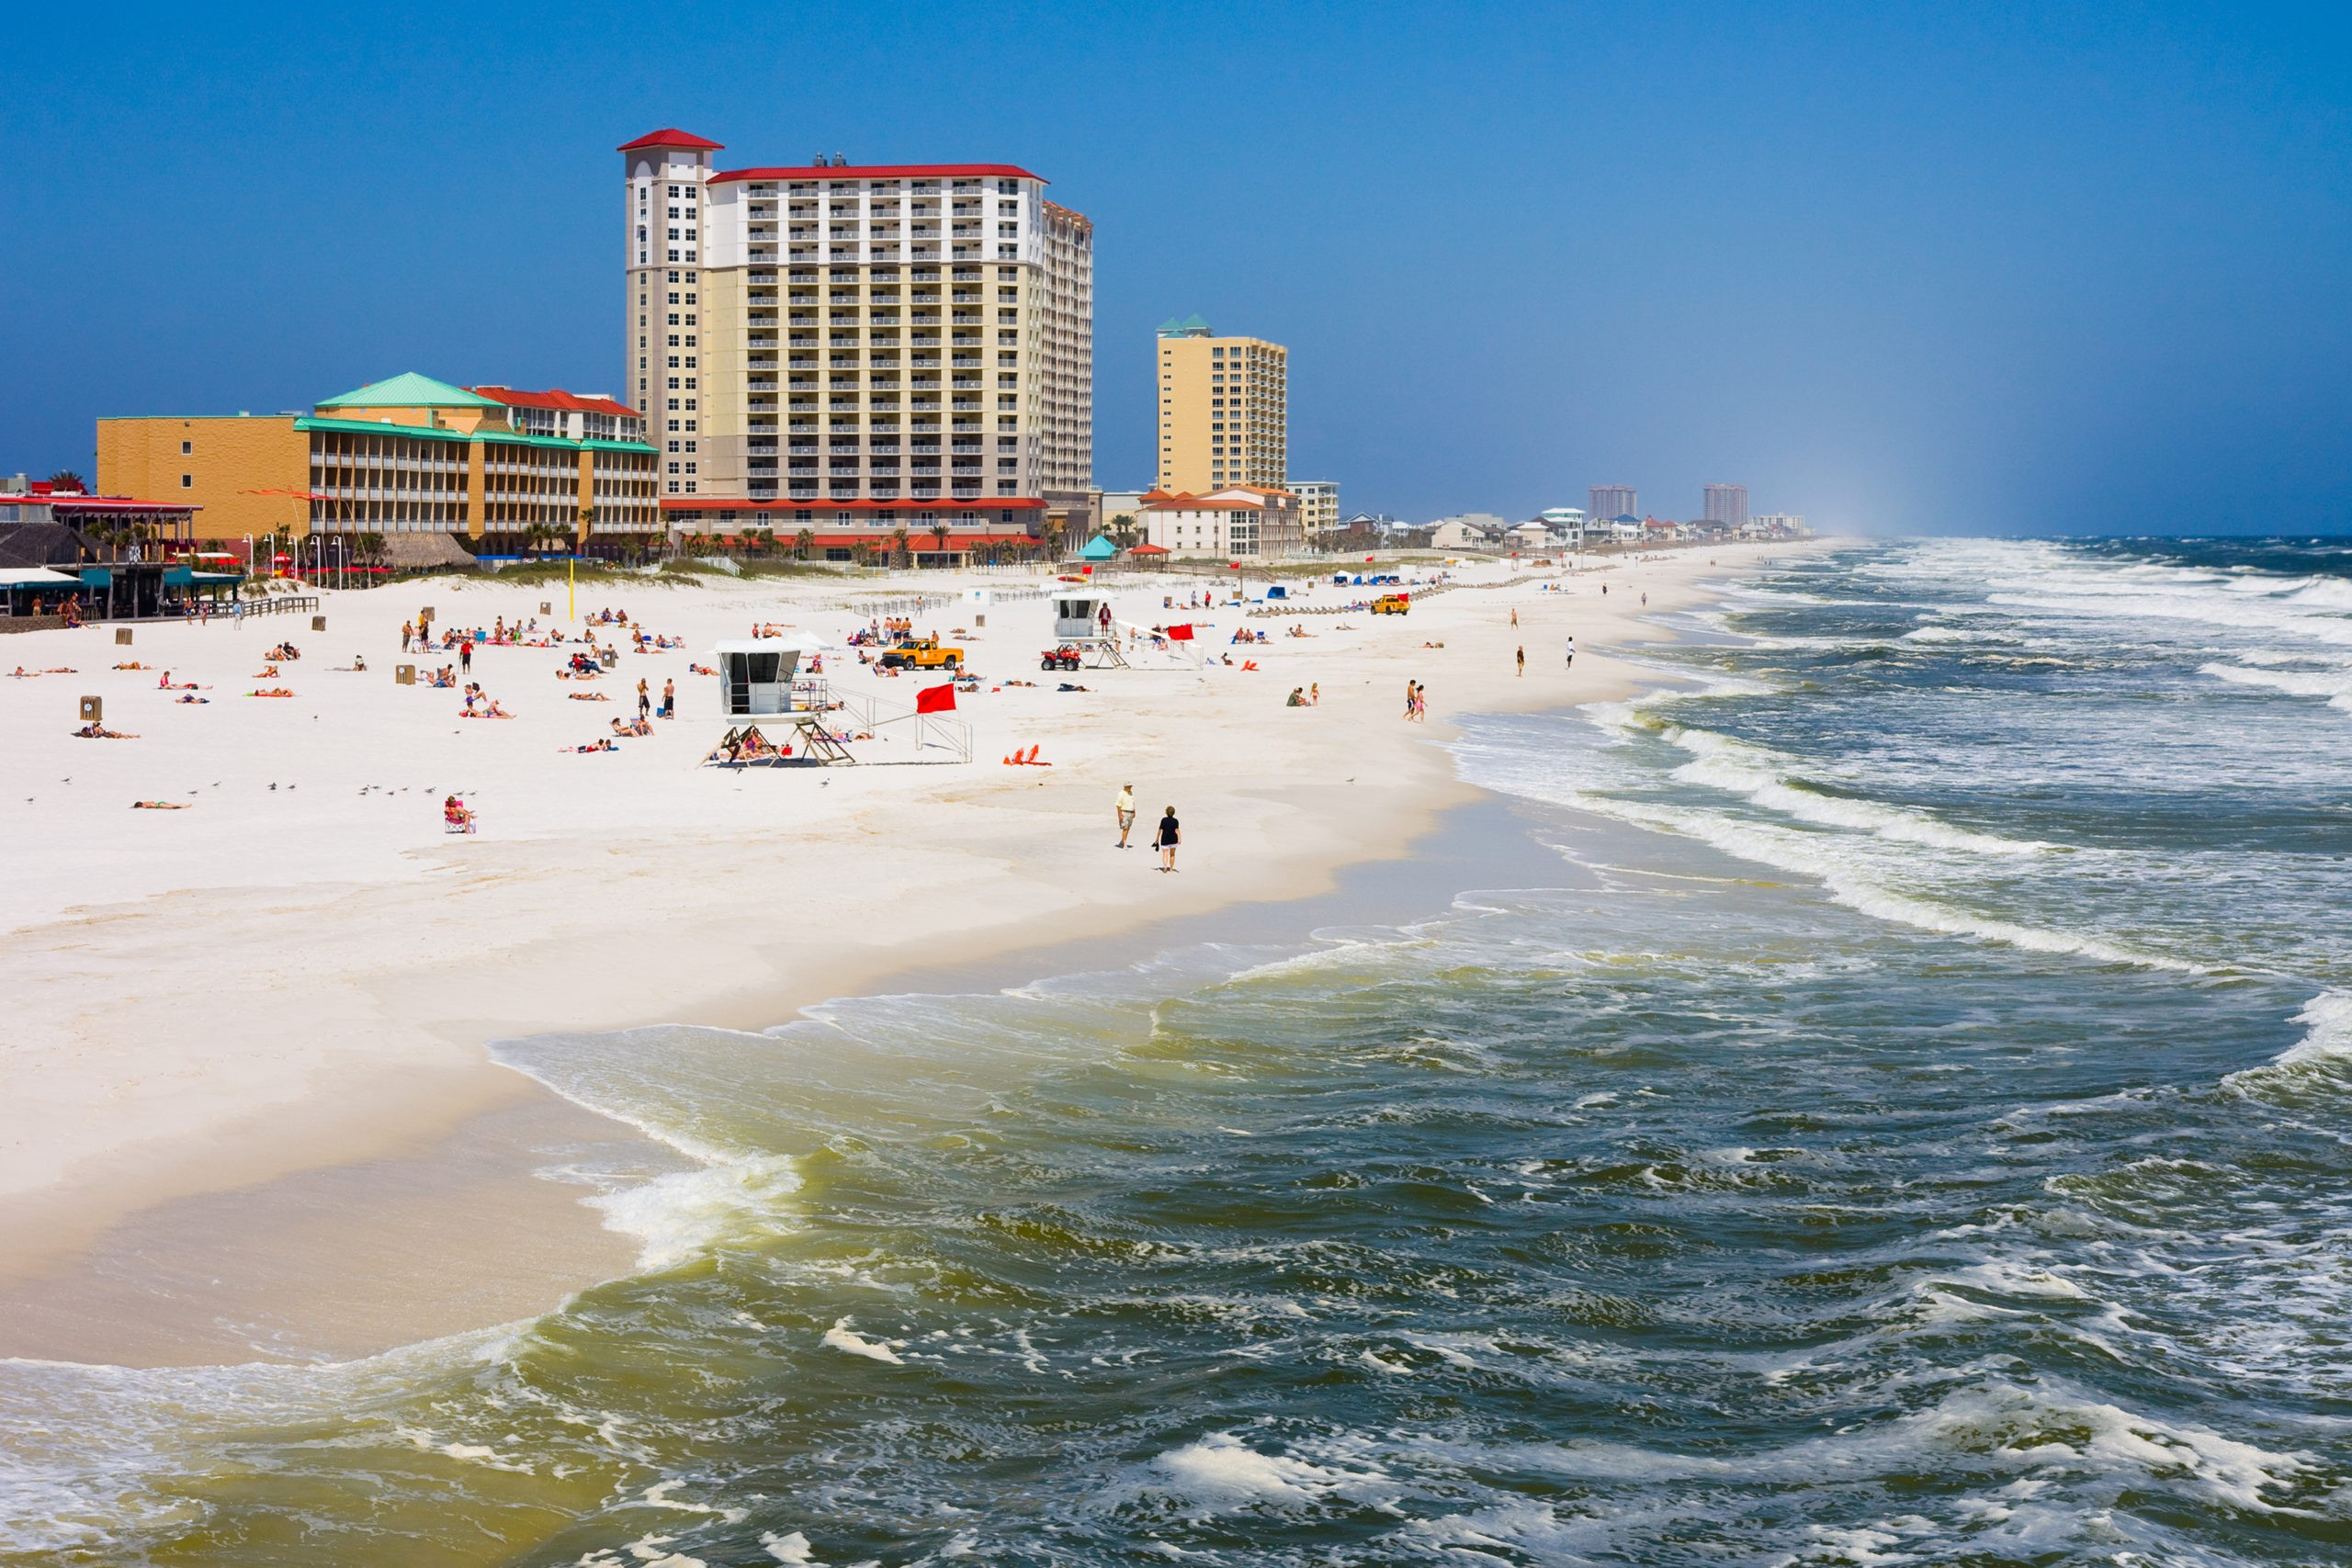 Pensacola BePensacola Beach in Florida, licencja: shutterstock/By Andrew Zarivnyach in Florida